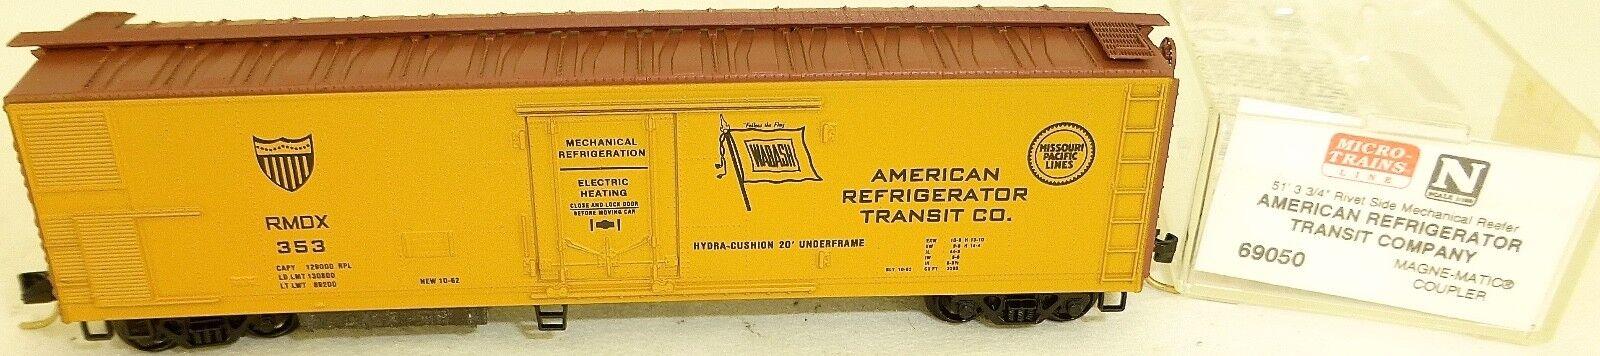 Micro-Trains Line 69050 Am Refrigerator Transit Comp Rivet Side n 1 160 X å